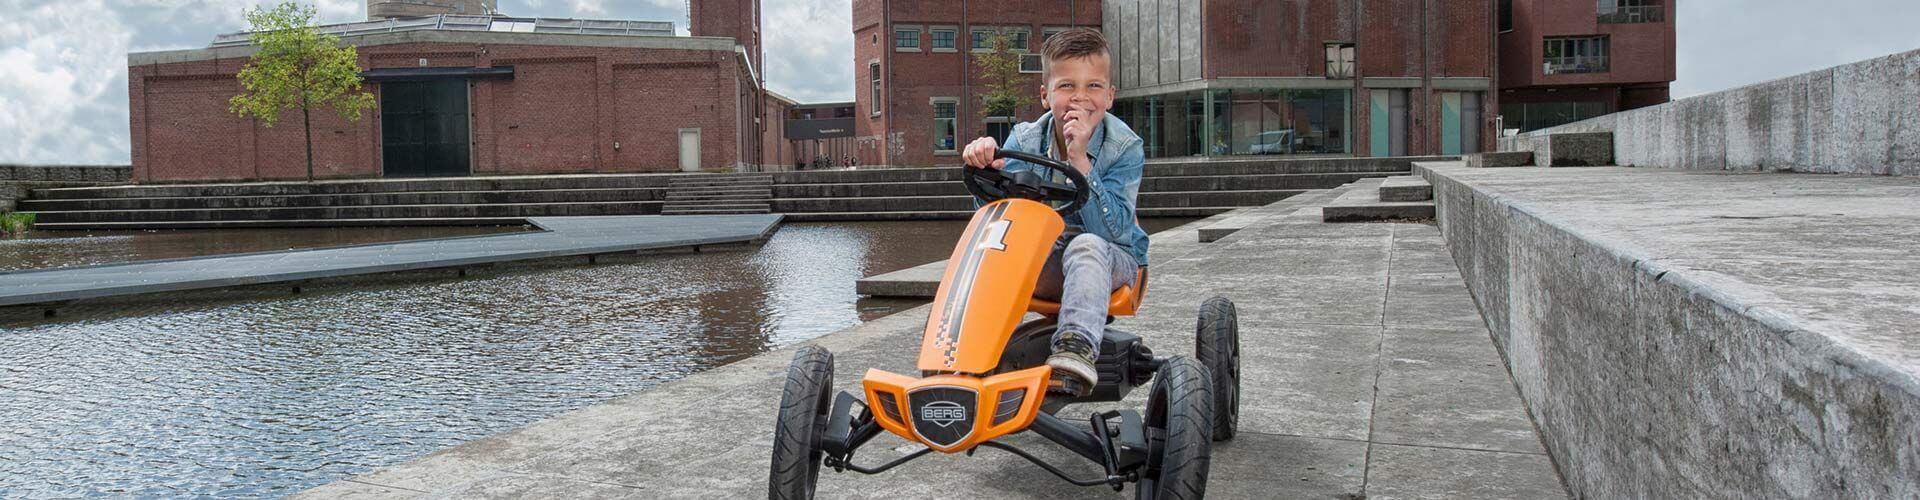 BERG Rally Orange - Gokart Größe M 4 bis 12 Jahre - gokart-profi.de